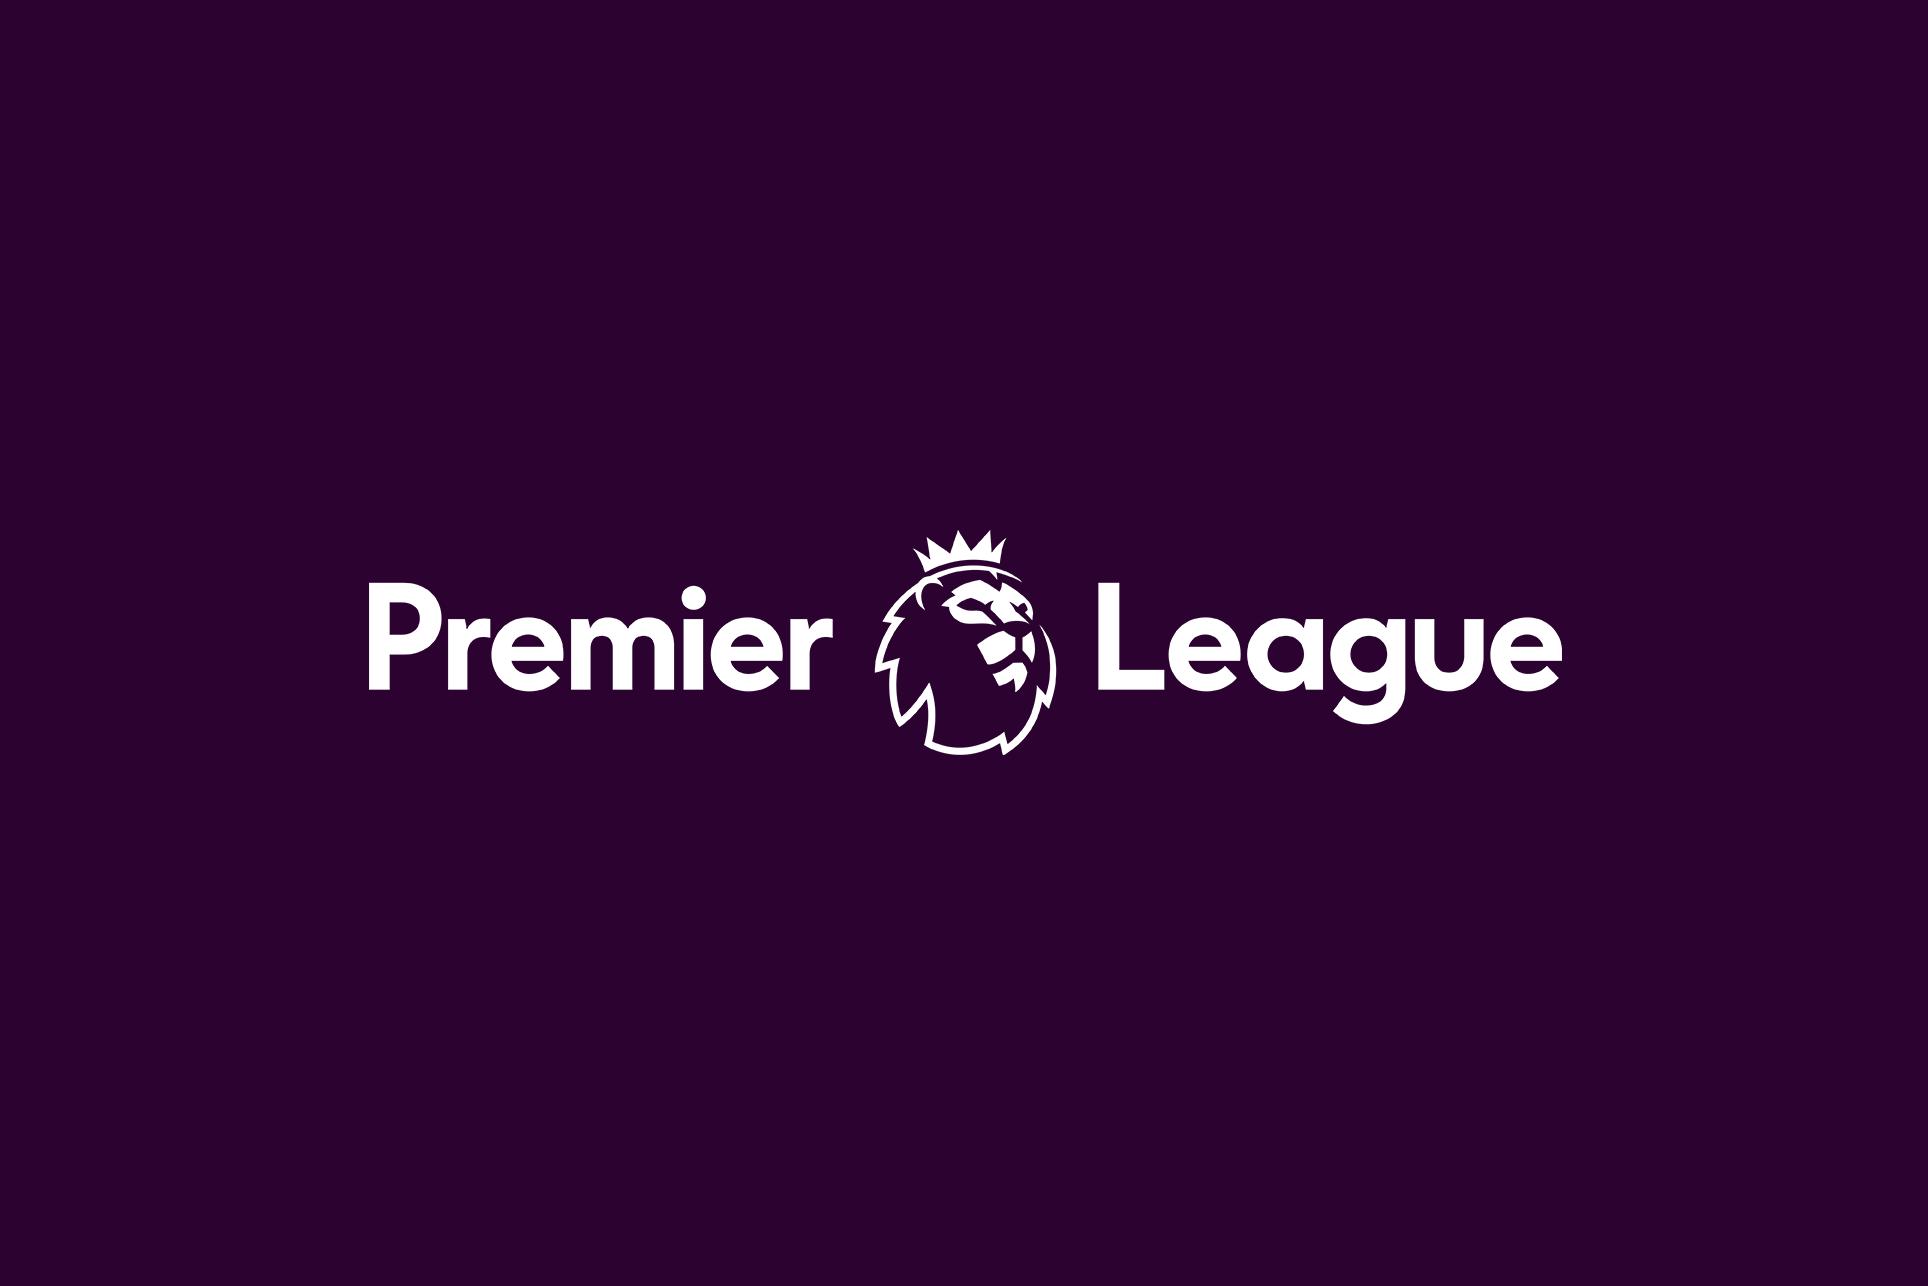 Premier League es suspendida hasta abril por coronavirus